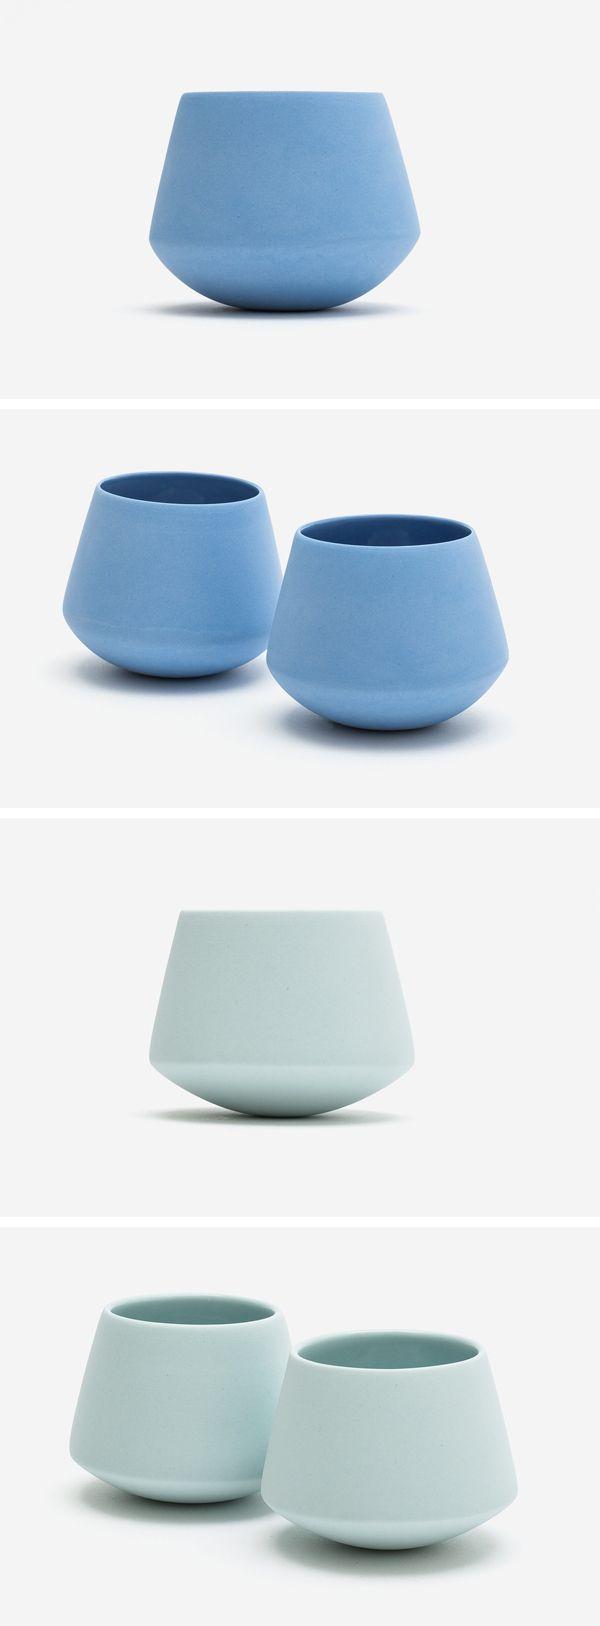 Porcelain Cup Small   by Elke van den Berg   001 Ceramics ...